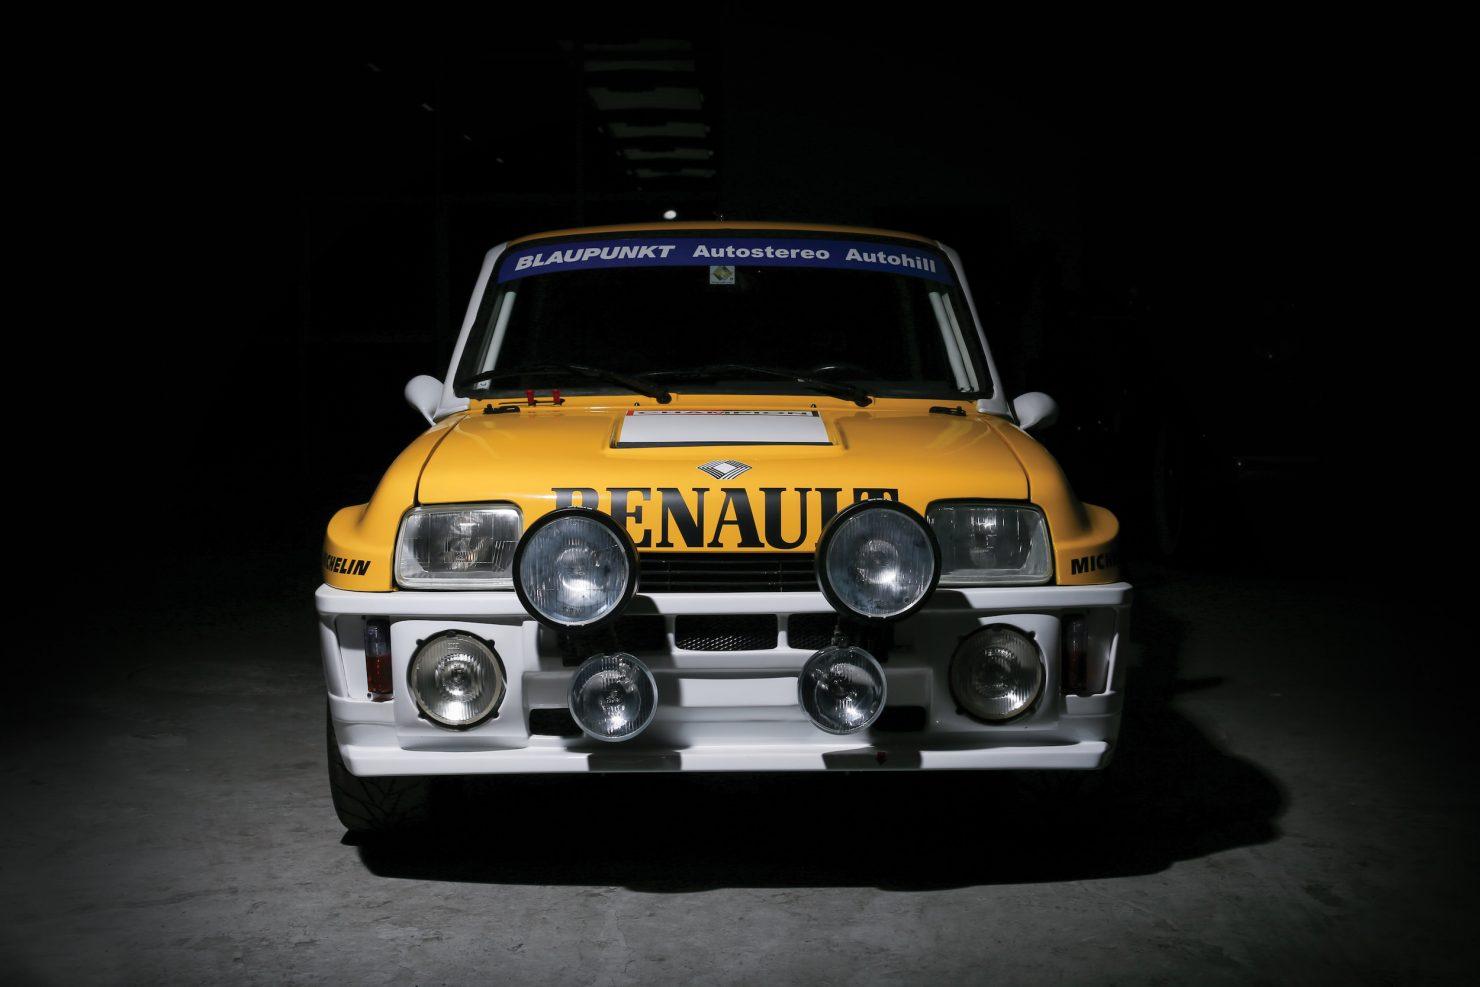 Renault 5 Turbo 6 1480x987 - 1980 Renault 5 Turbo